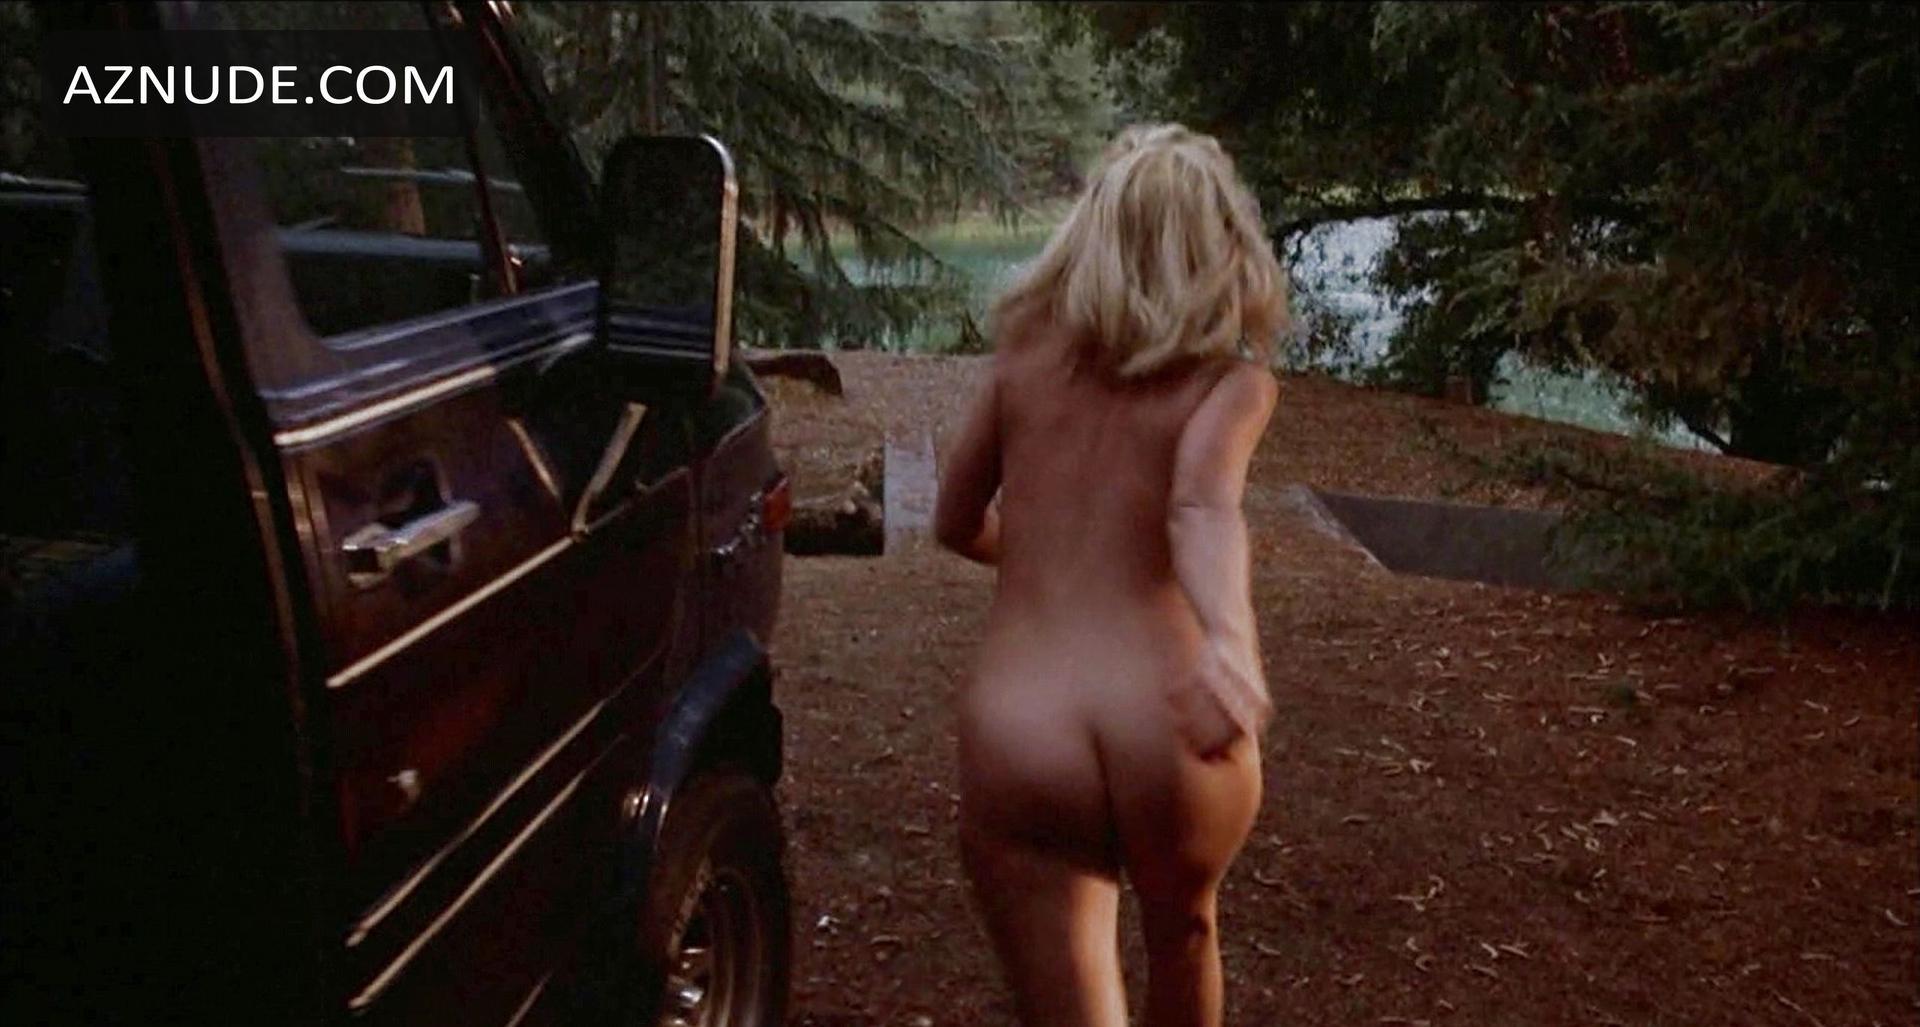 10 To Midnight Nude Scenes - Aznude-3222